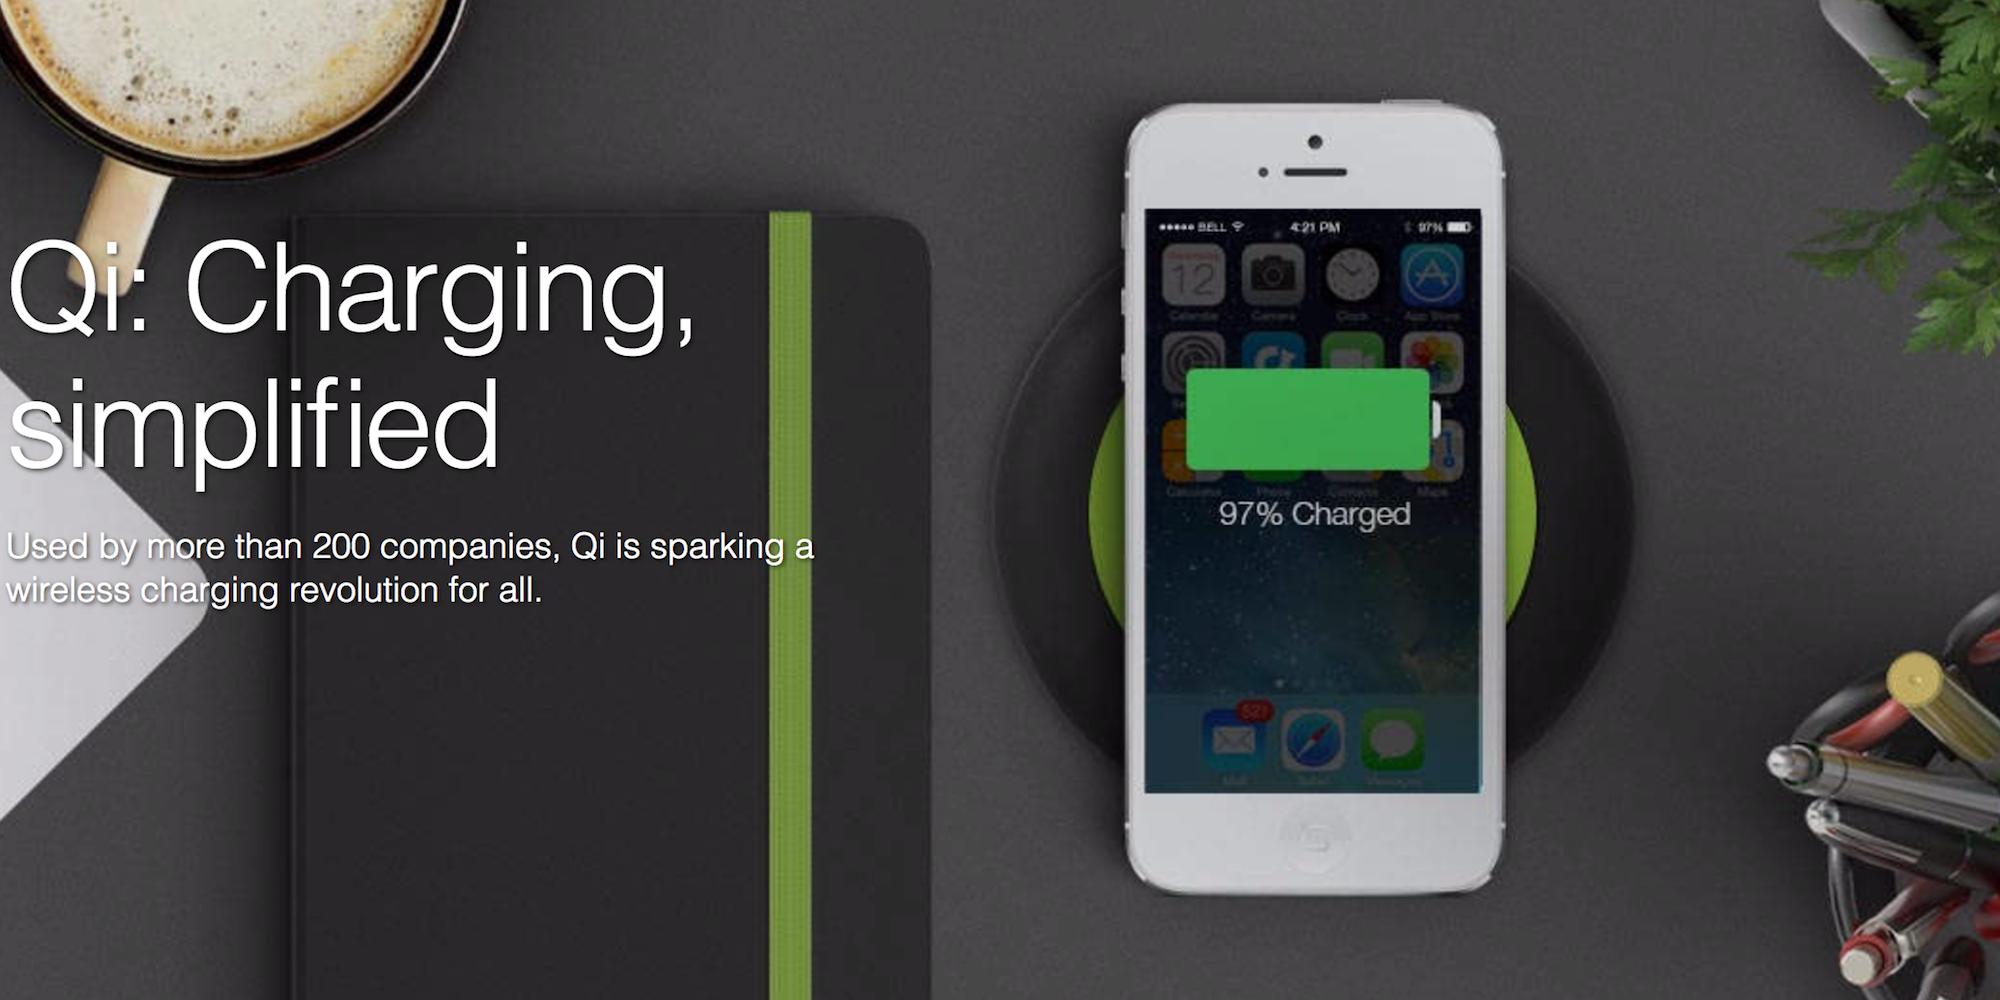 qi-wireless-charging